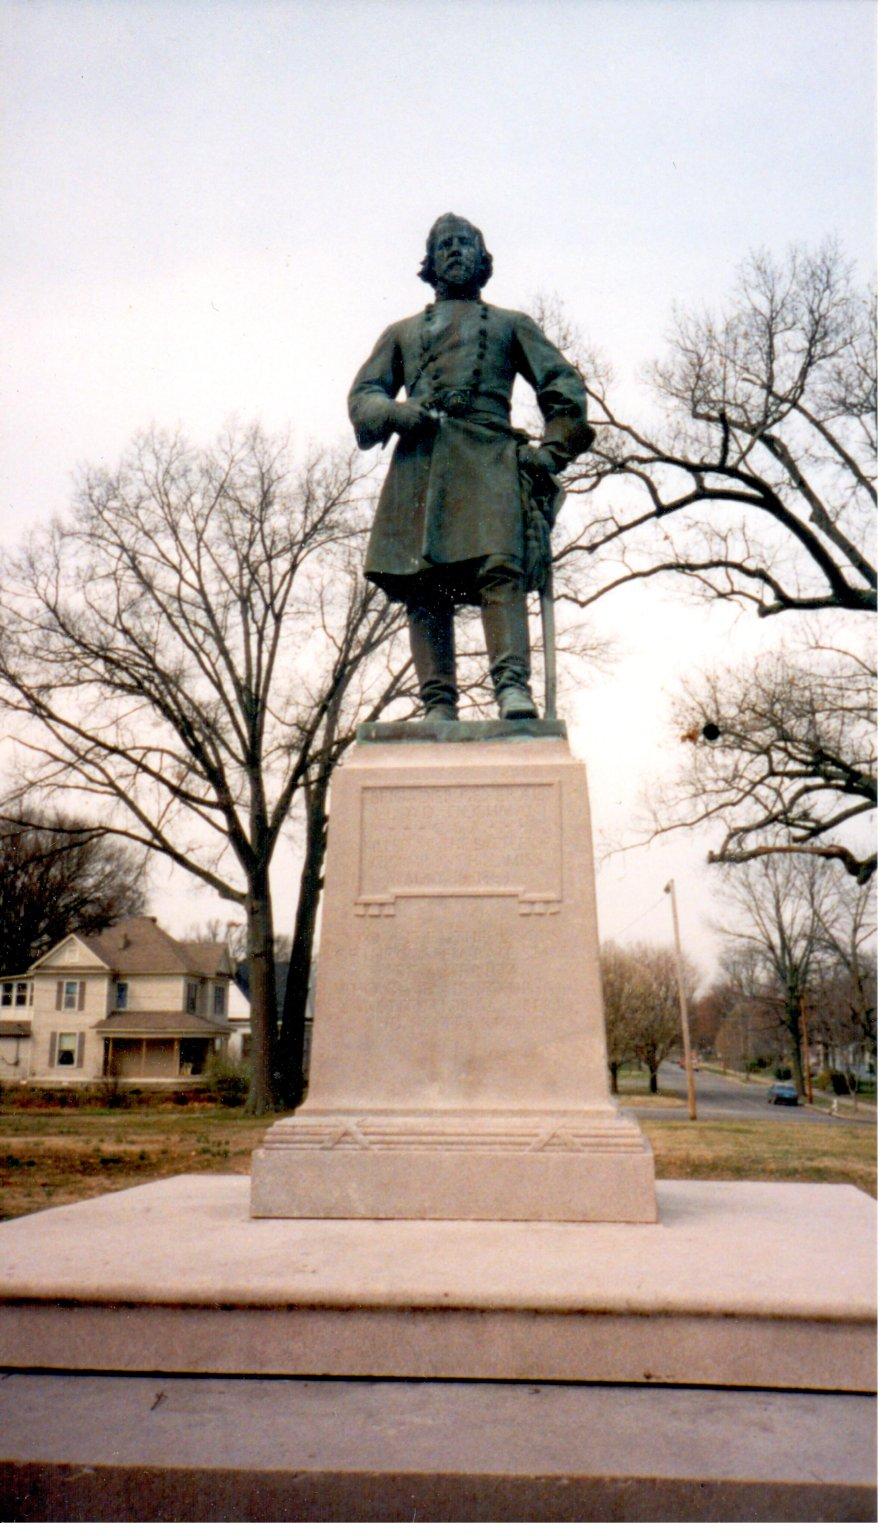 Statue of General Lloyd Tilghman